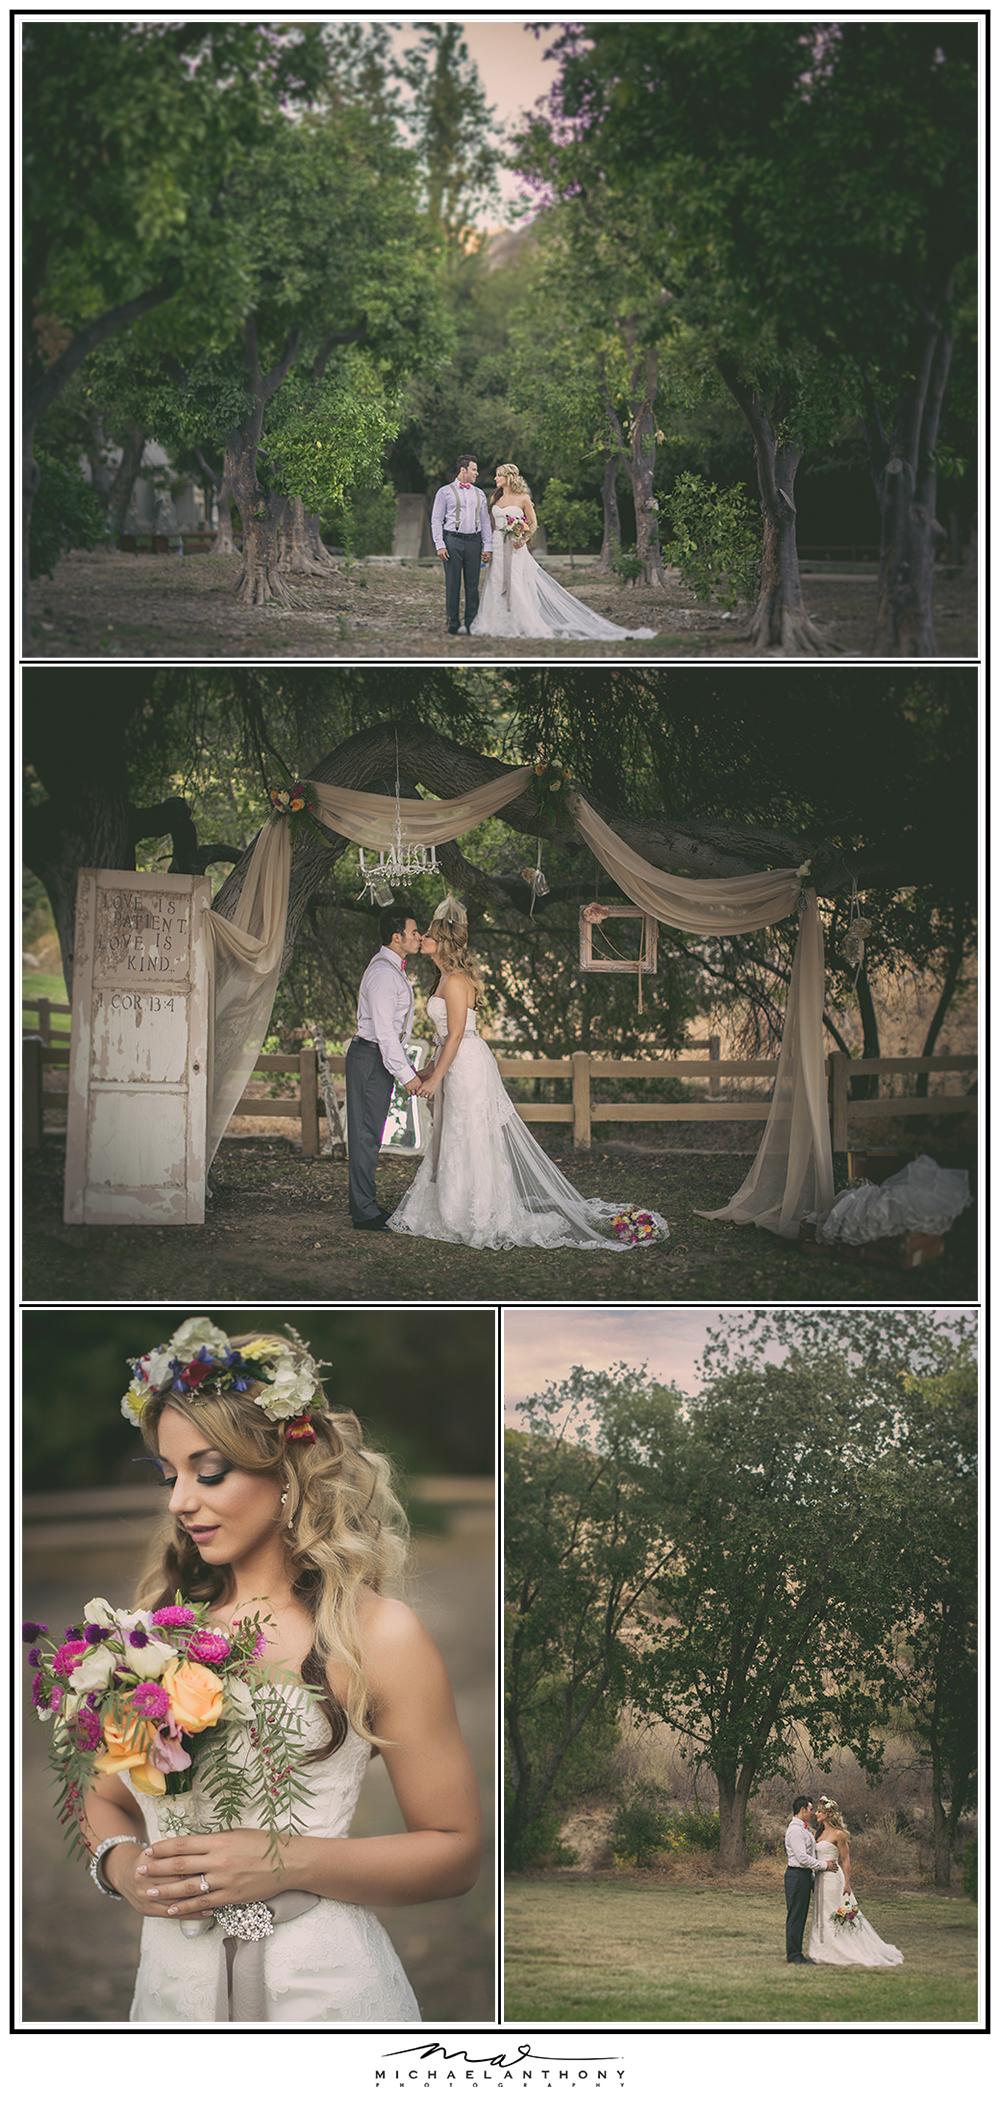 Whimsical Shabby Chic Wedding